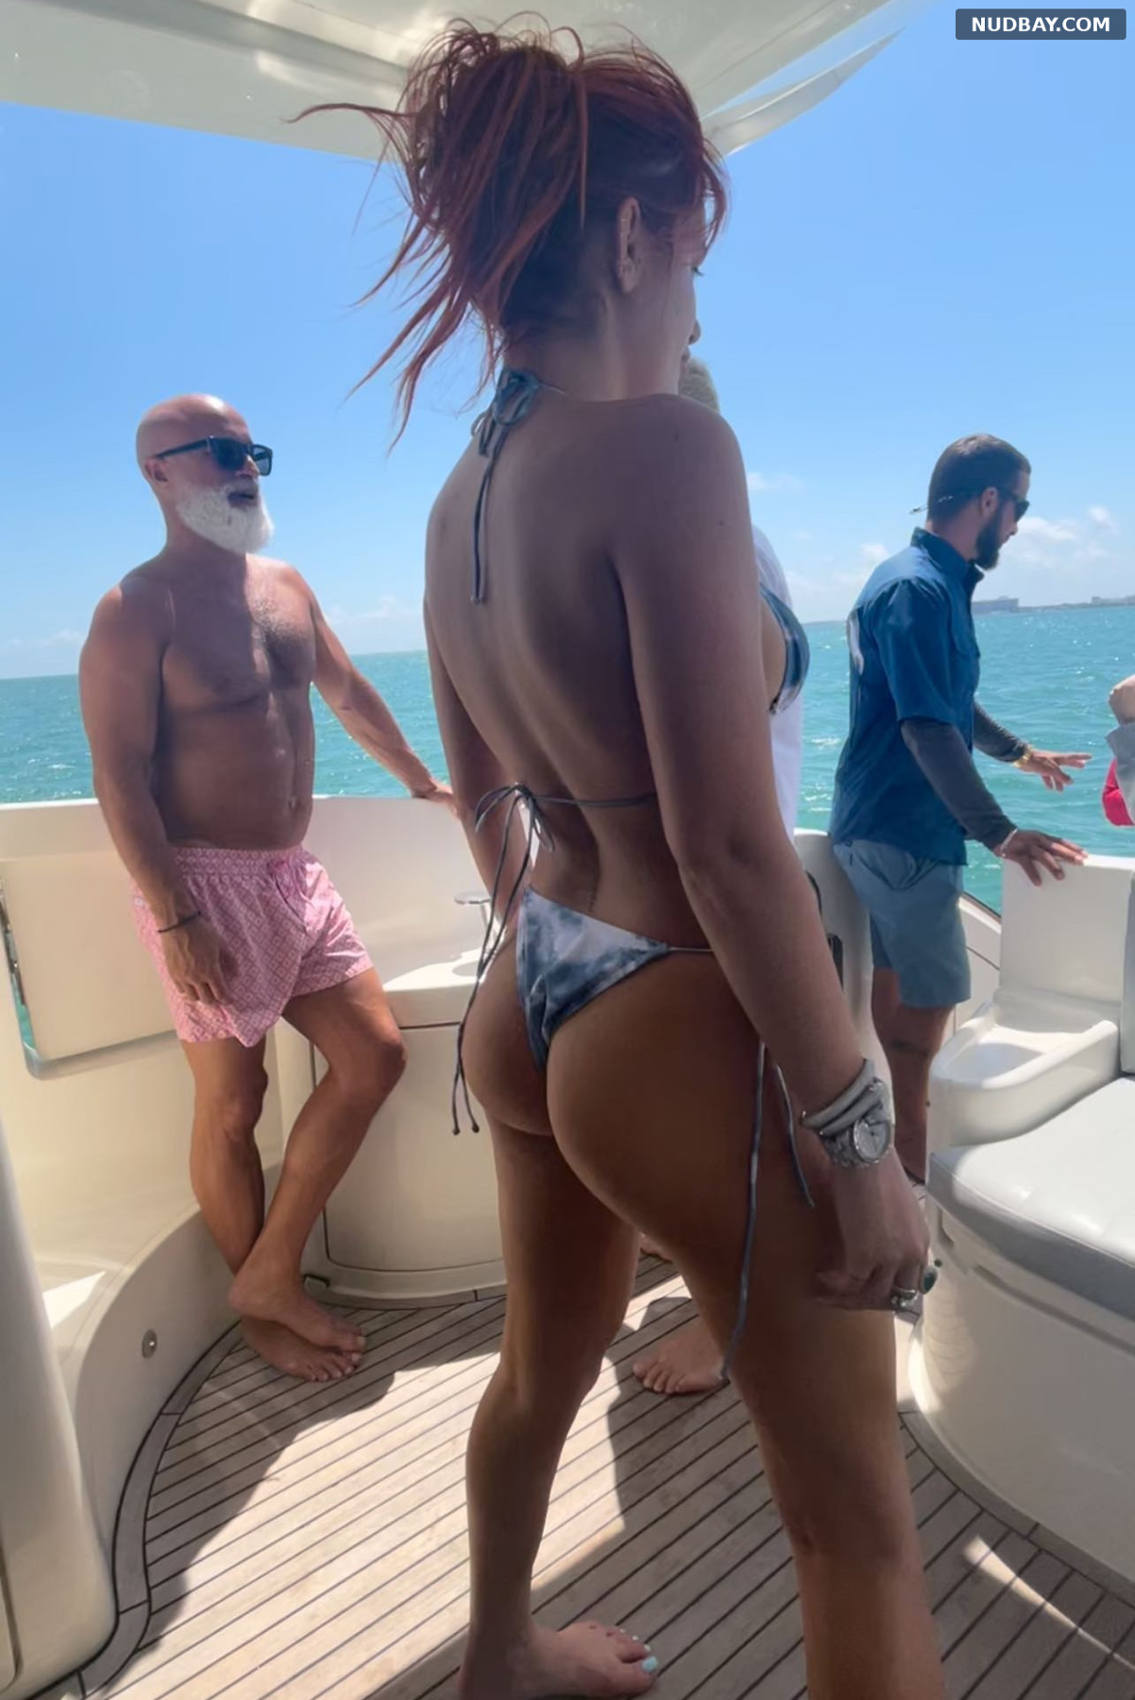 Bella Thorne Ass in Bikini at a Boat May 06 2021